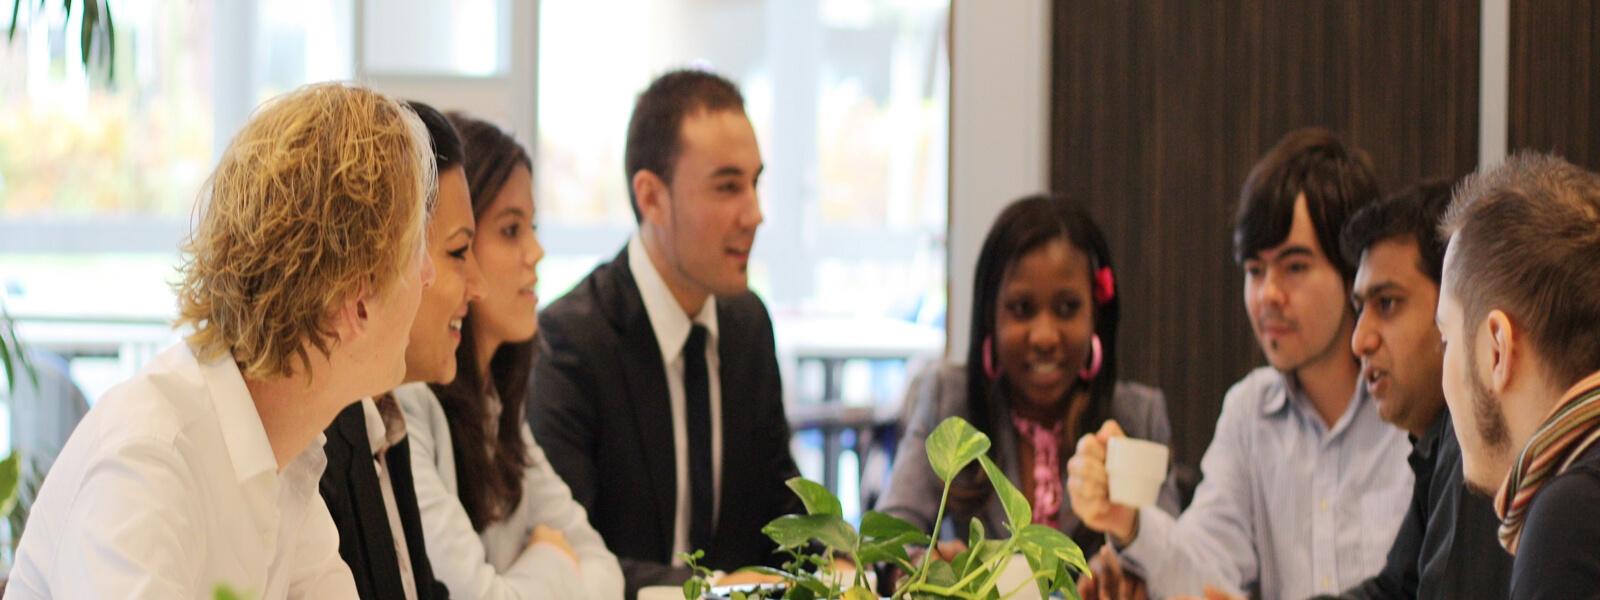 studyinholland-universitiesofappliedsciences-bachelor-marketing and communication- wittenborg-apeldoorn- holland